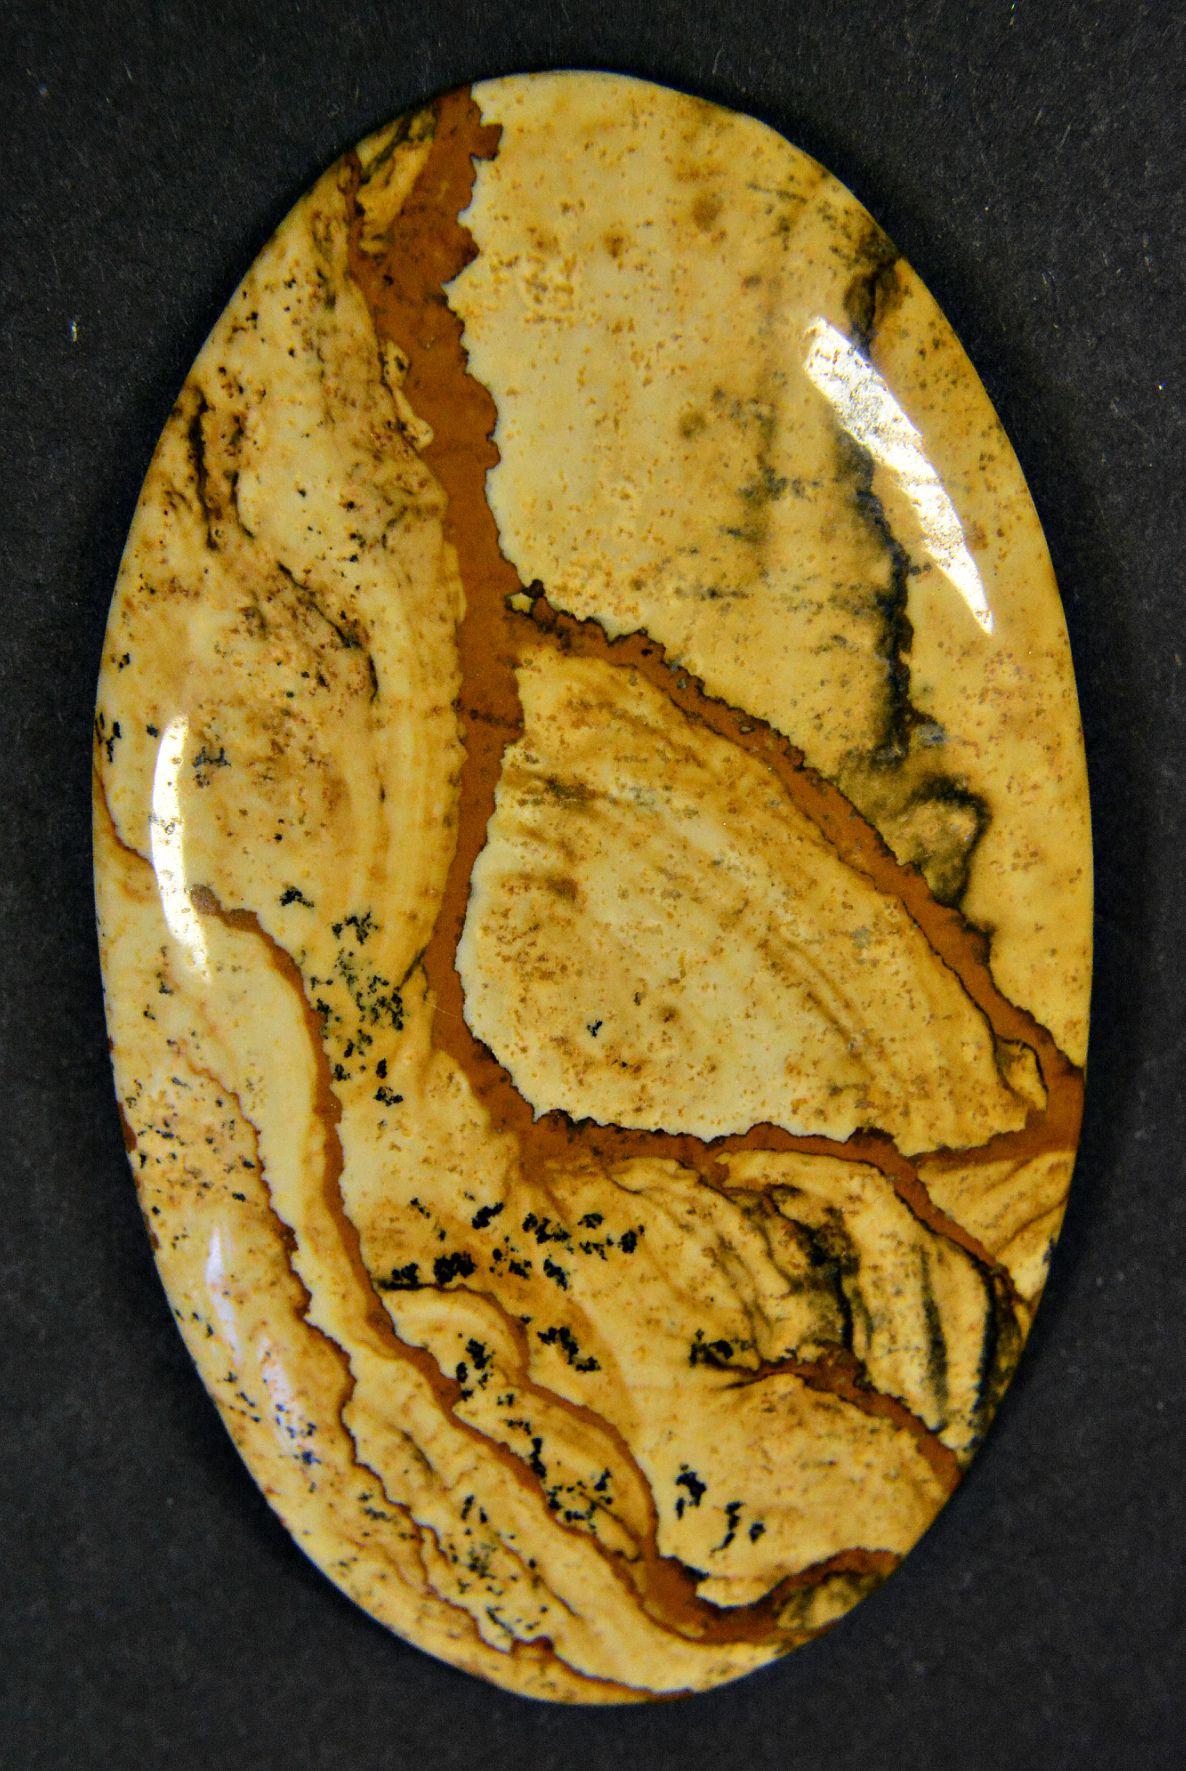 натура яшма оптом природные минералы агат натуральные камни кварц кабошоны